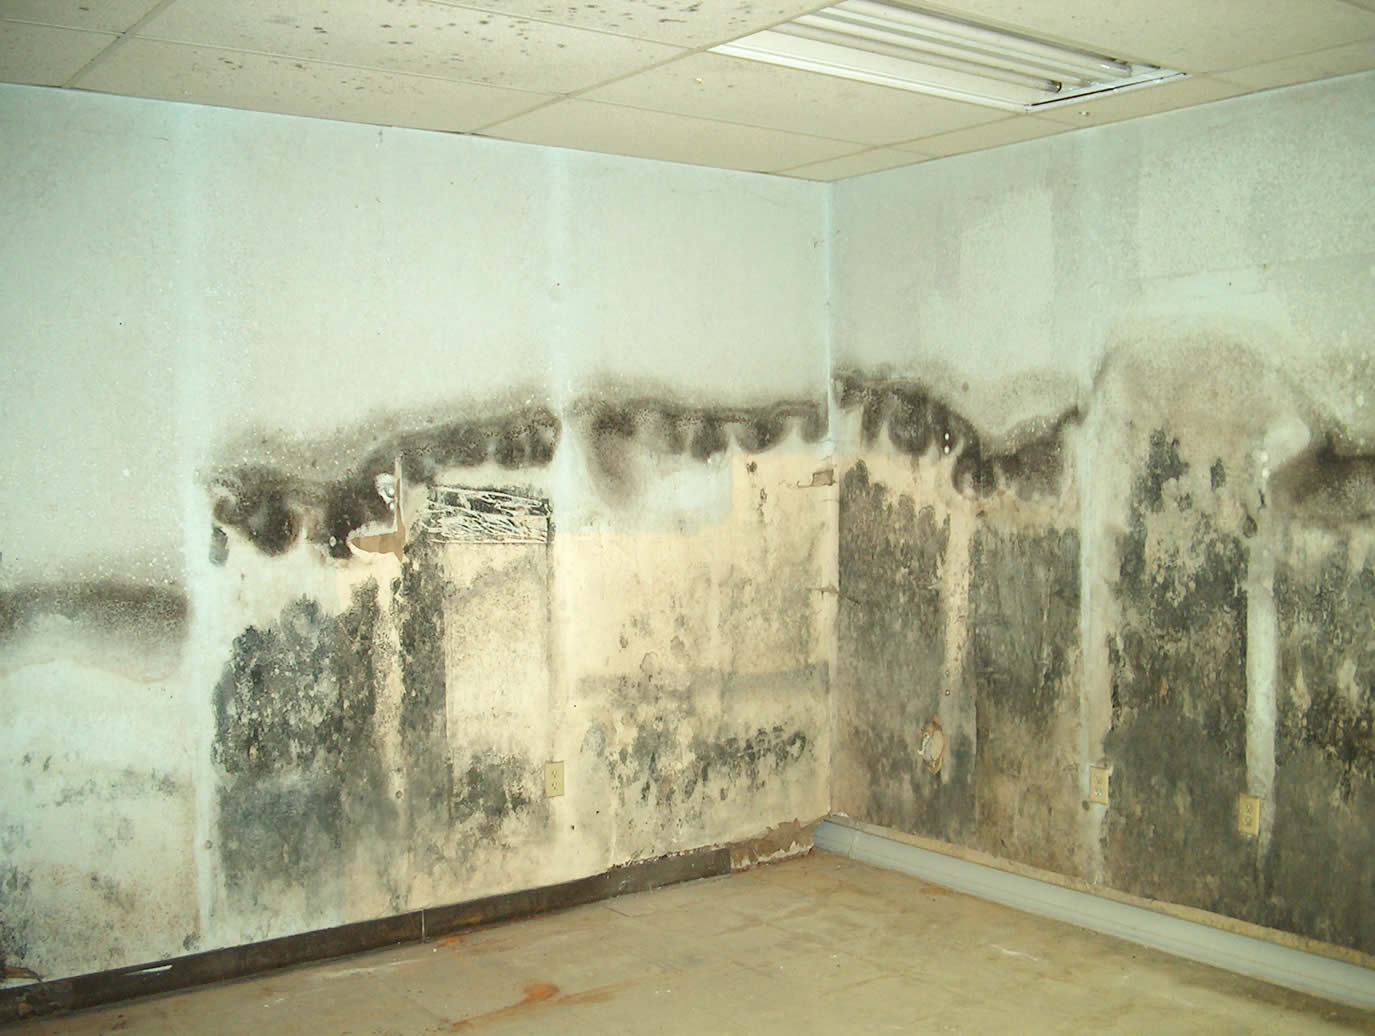 Basement Mold and moisture problems